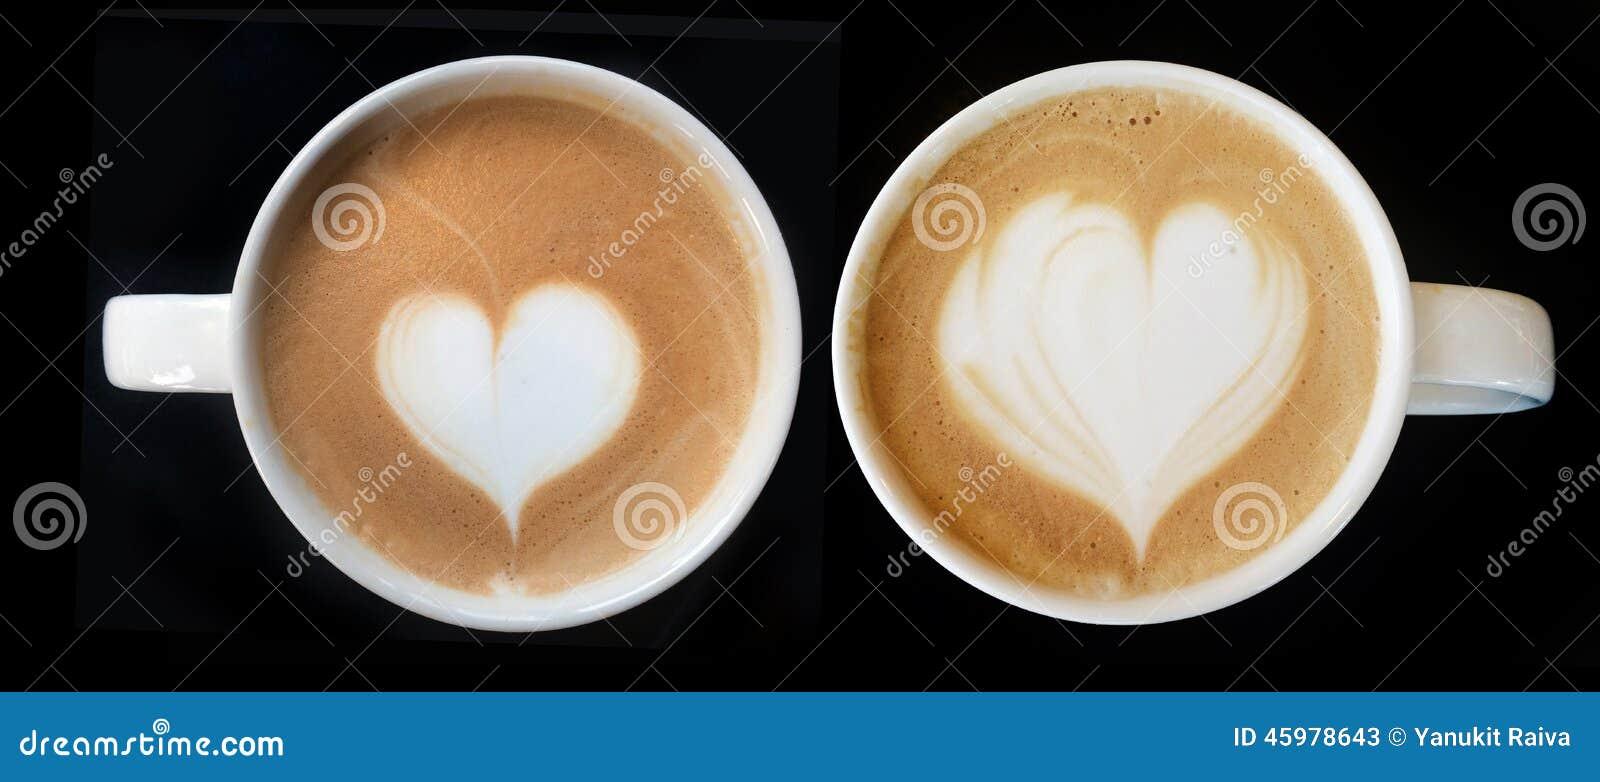 Schale des Lattekunstkaffee-Herzsymbols